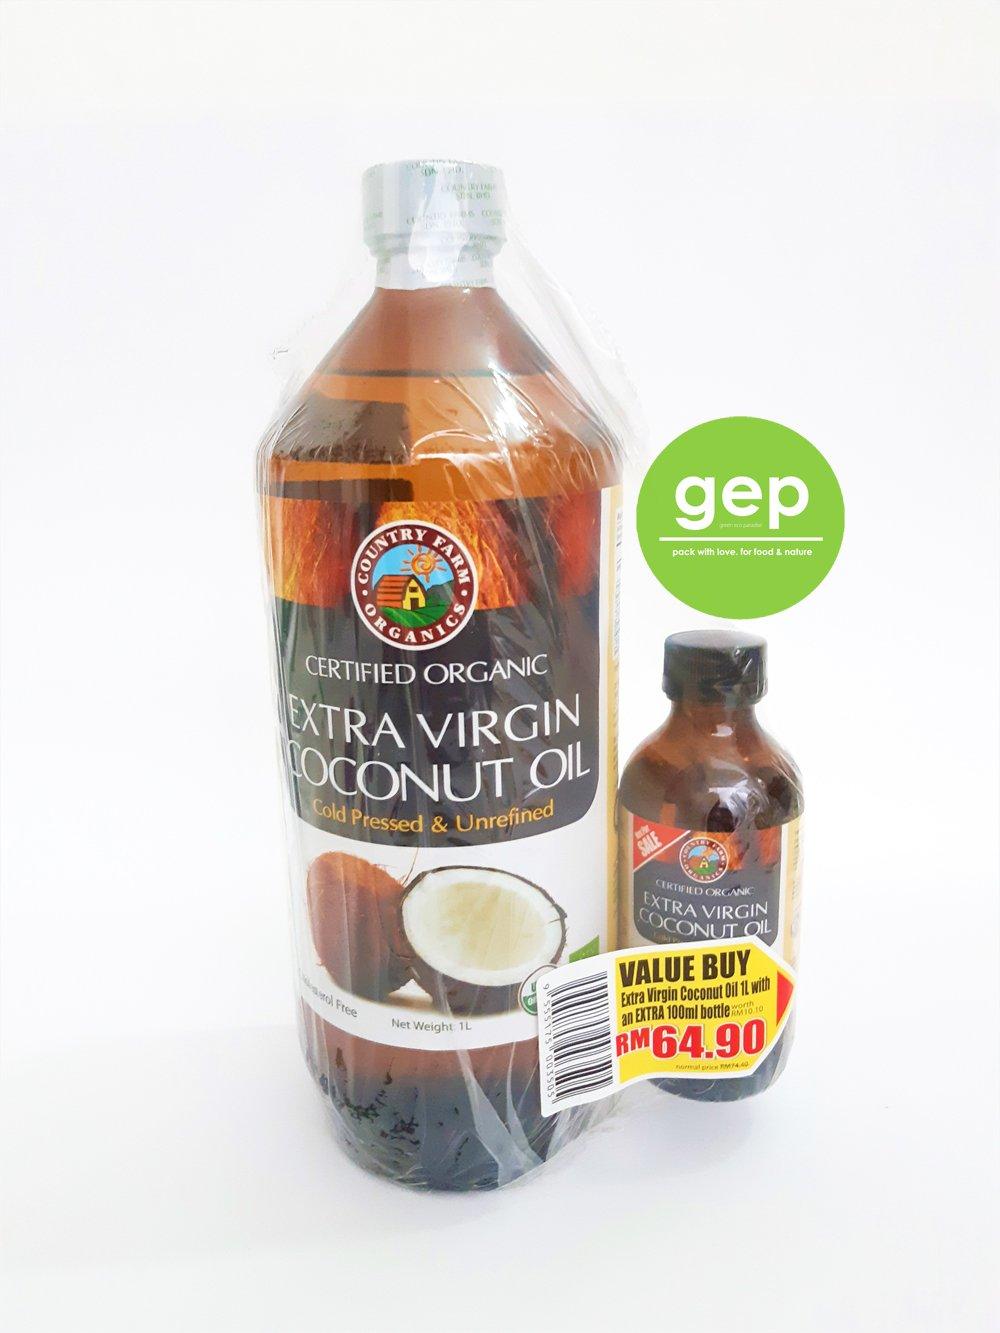 Extra Virgin Coconut Oil 1 Litre Green Eco Paradise Penang Malaysia